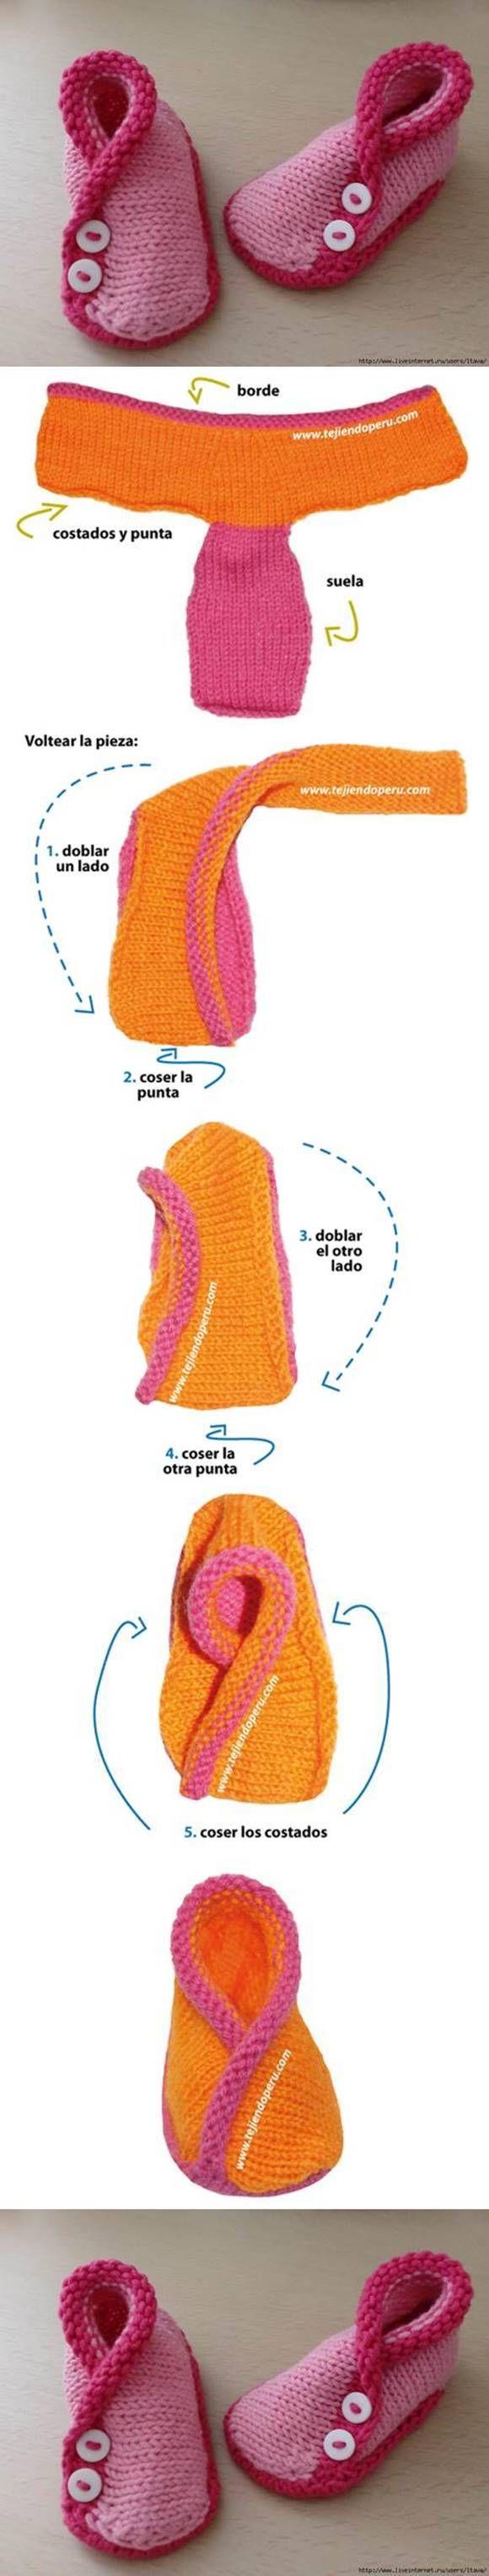 DIY Adorable Knitted Kimono Baby Booties | Babyschühchen, Stricken ...